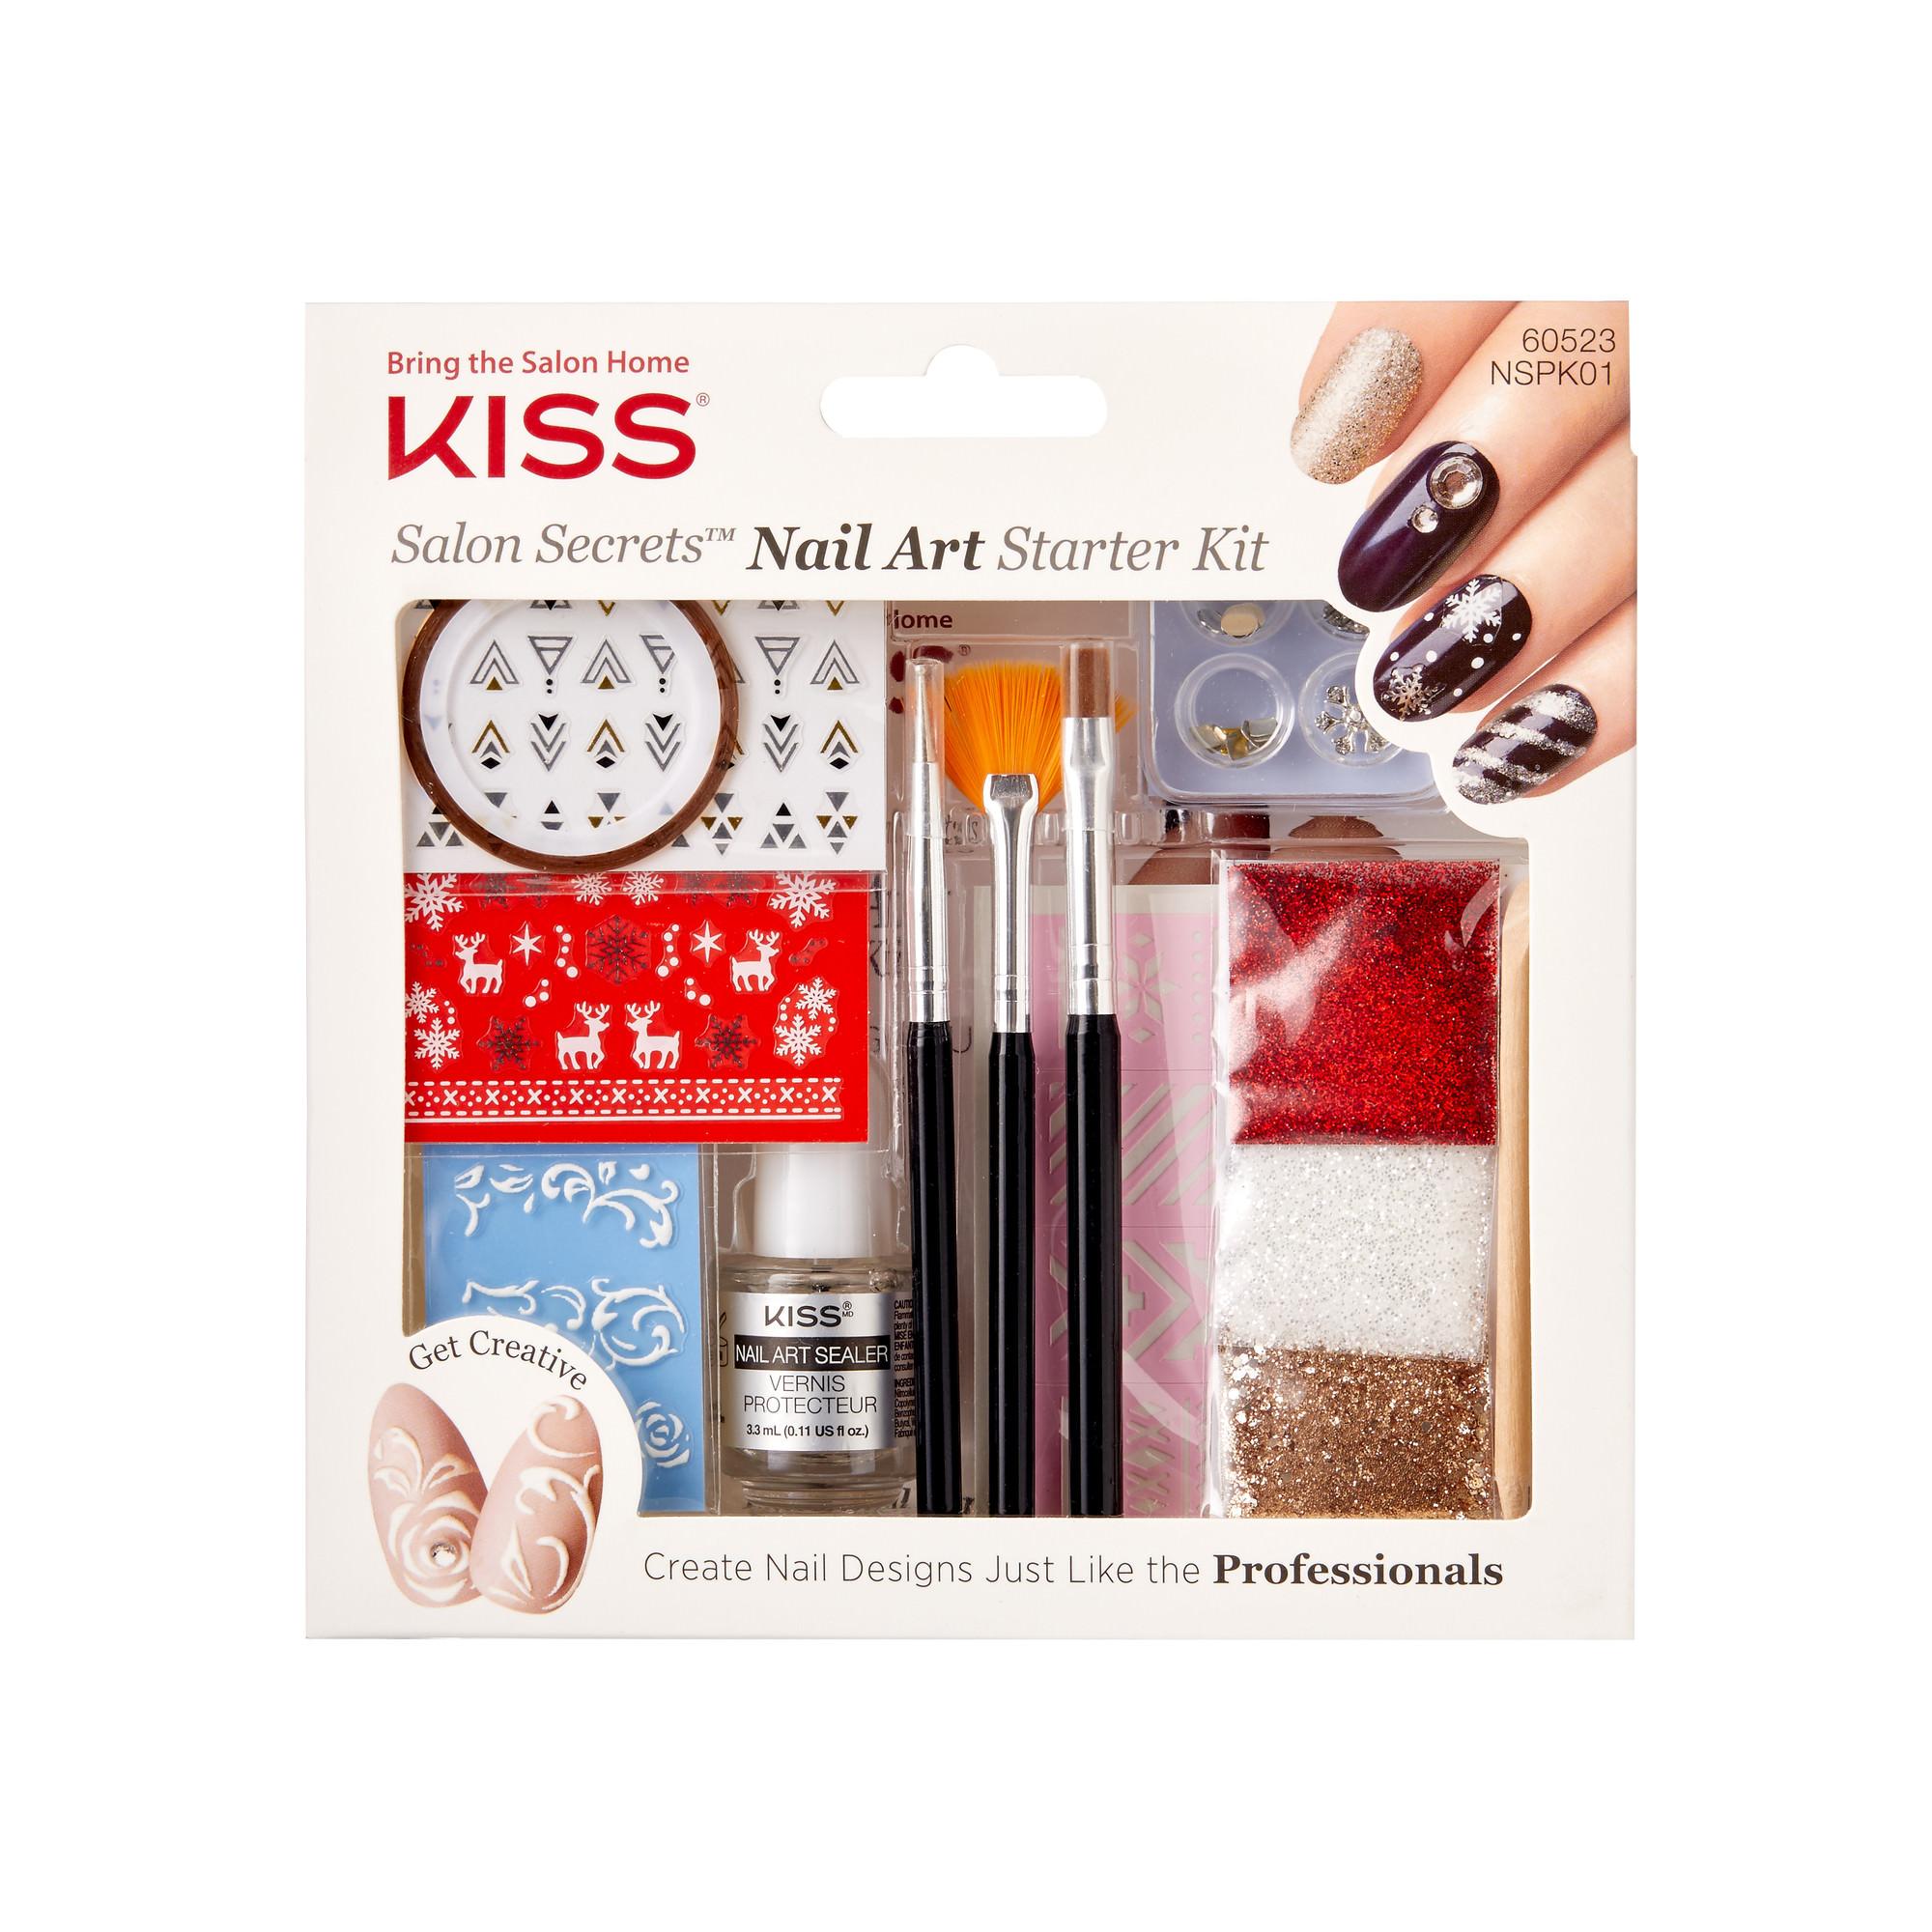 KISS Salon Secrets™ Nail Art Starter Kit